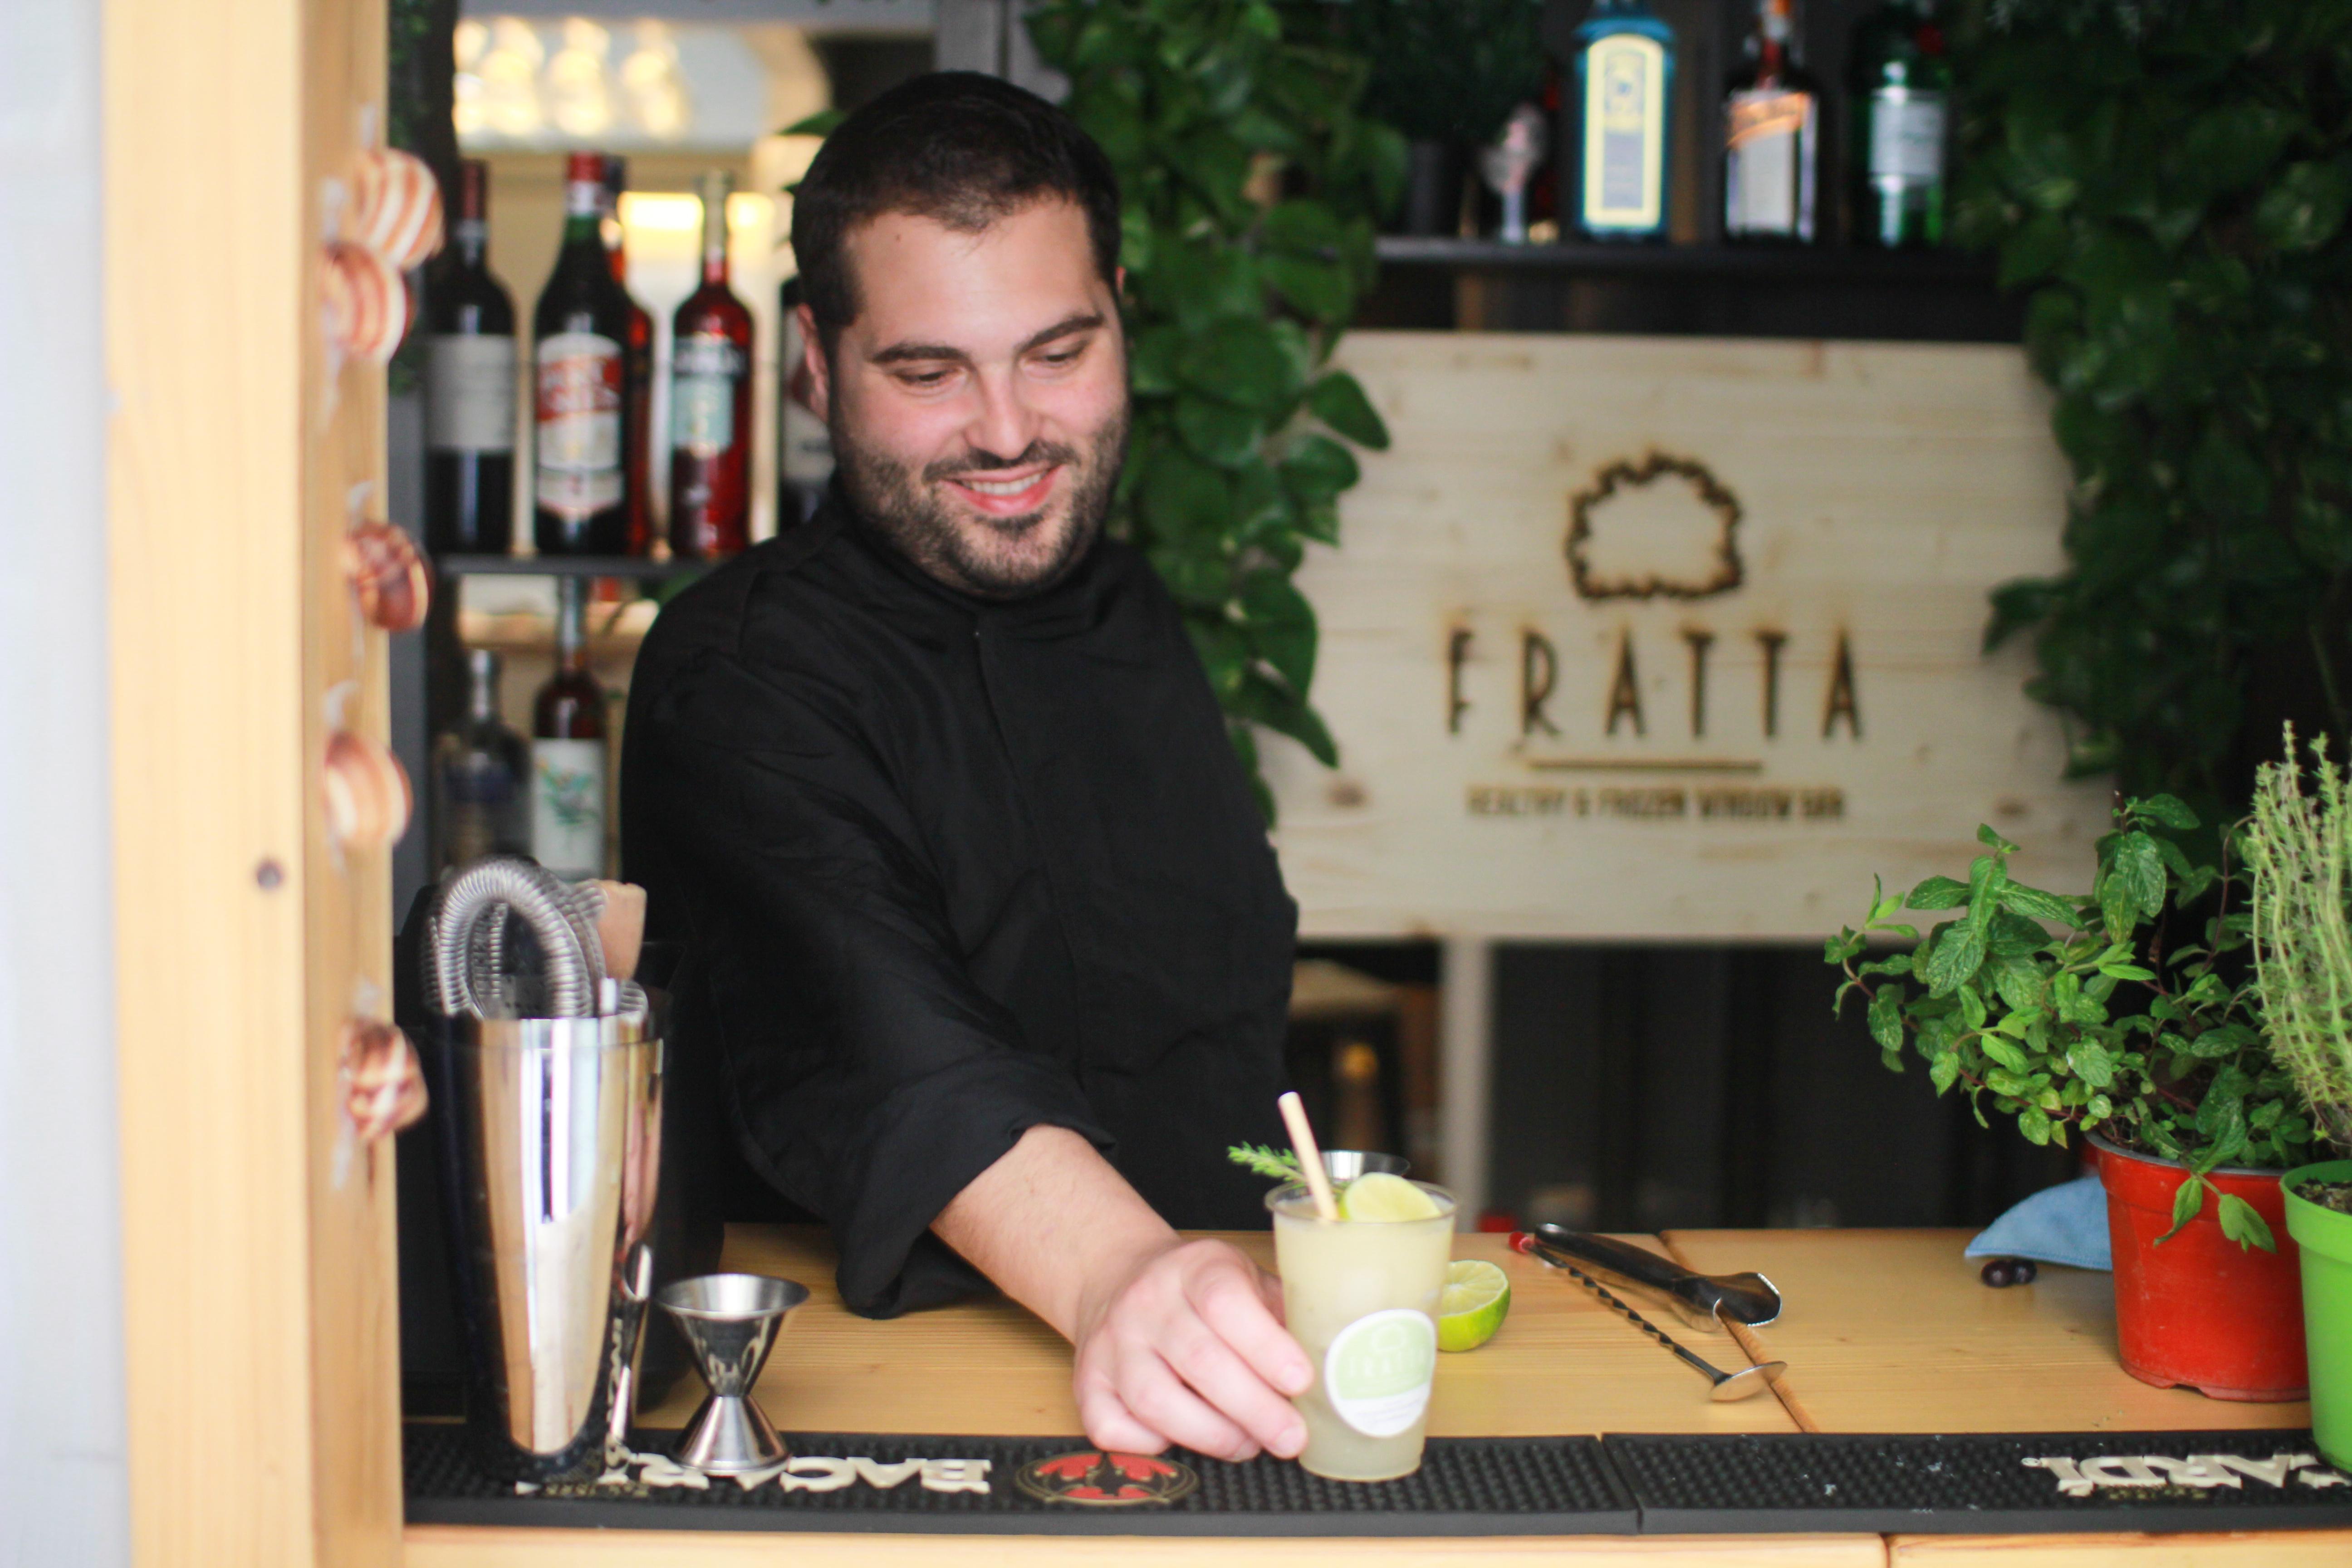 Fratta-Opening-14x